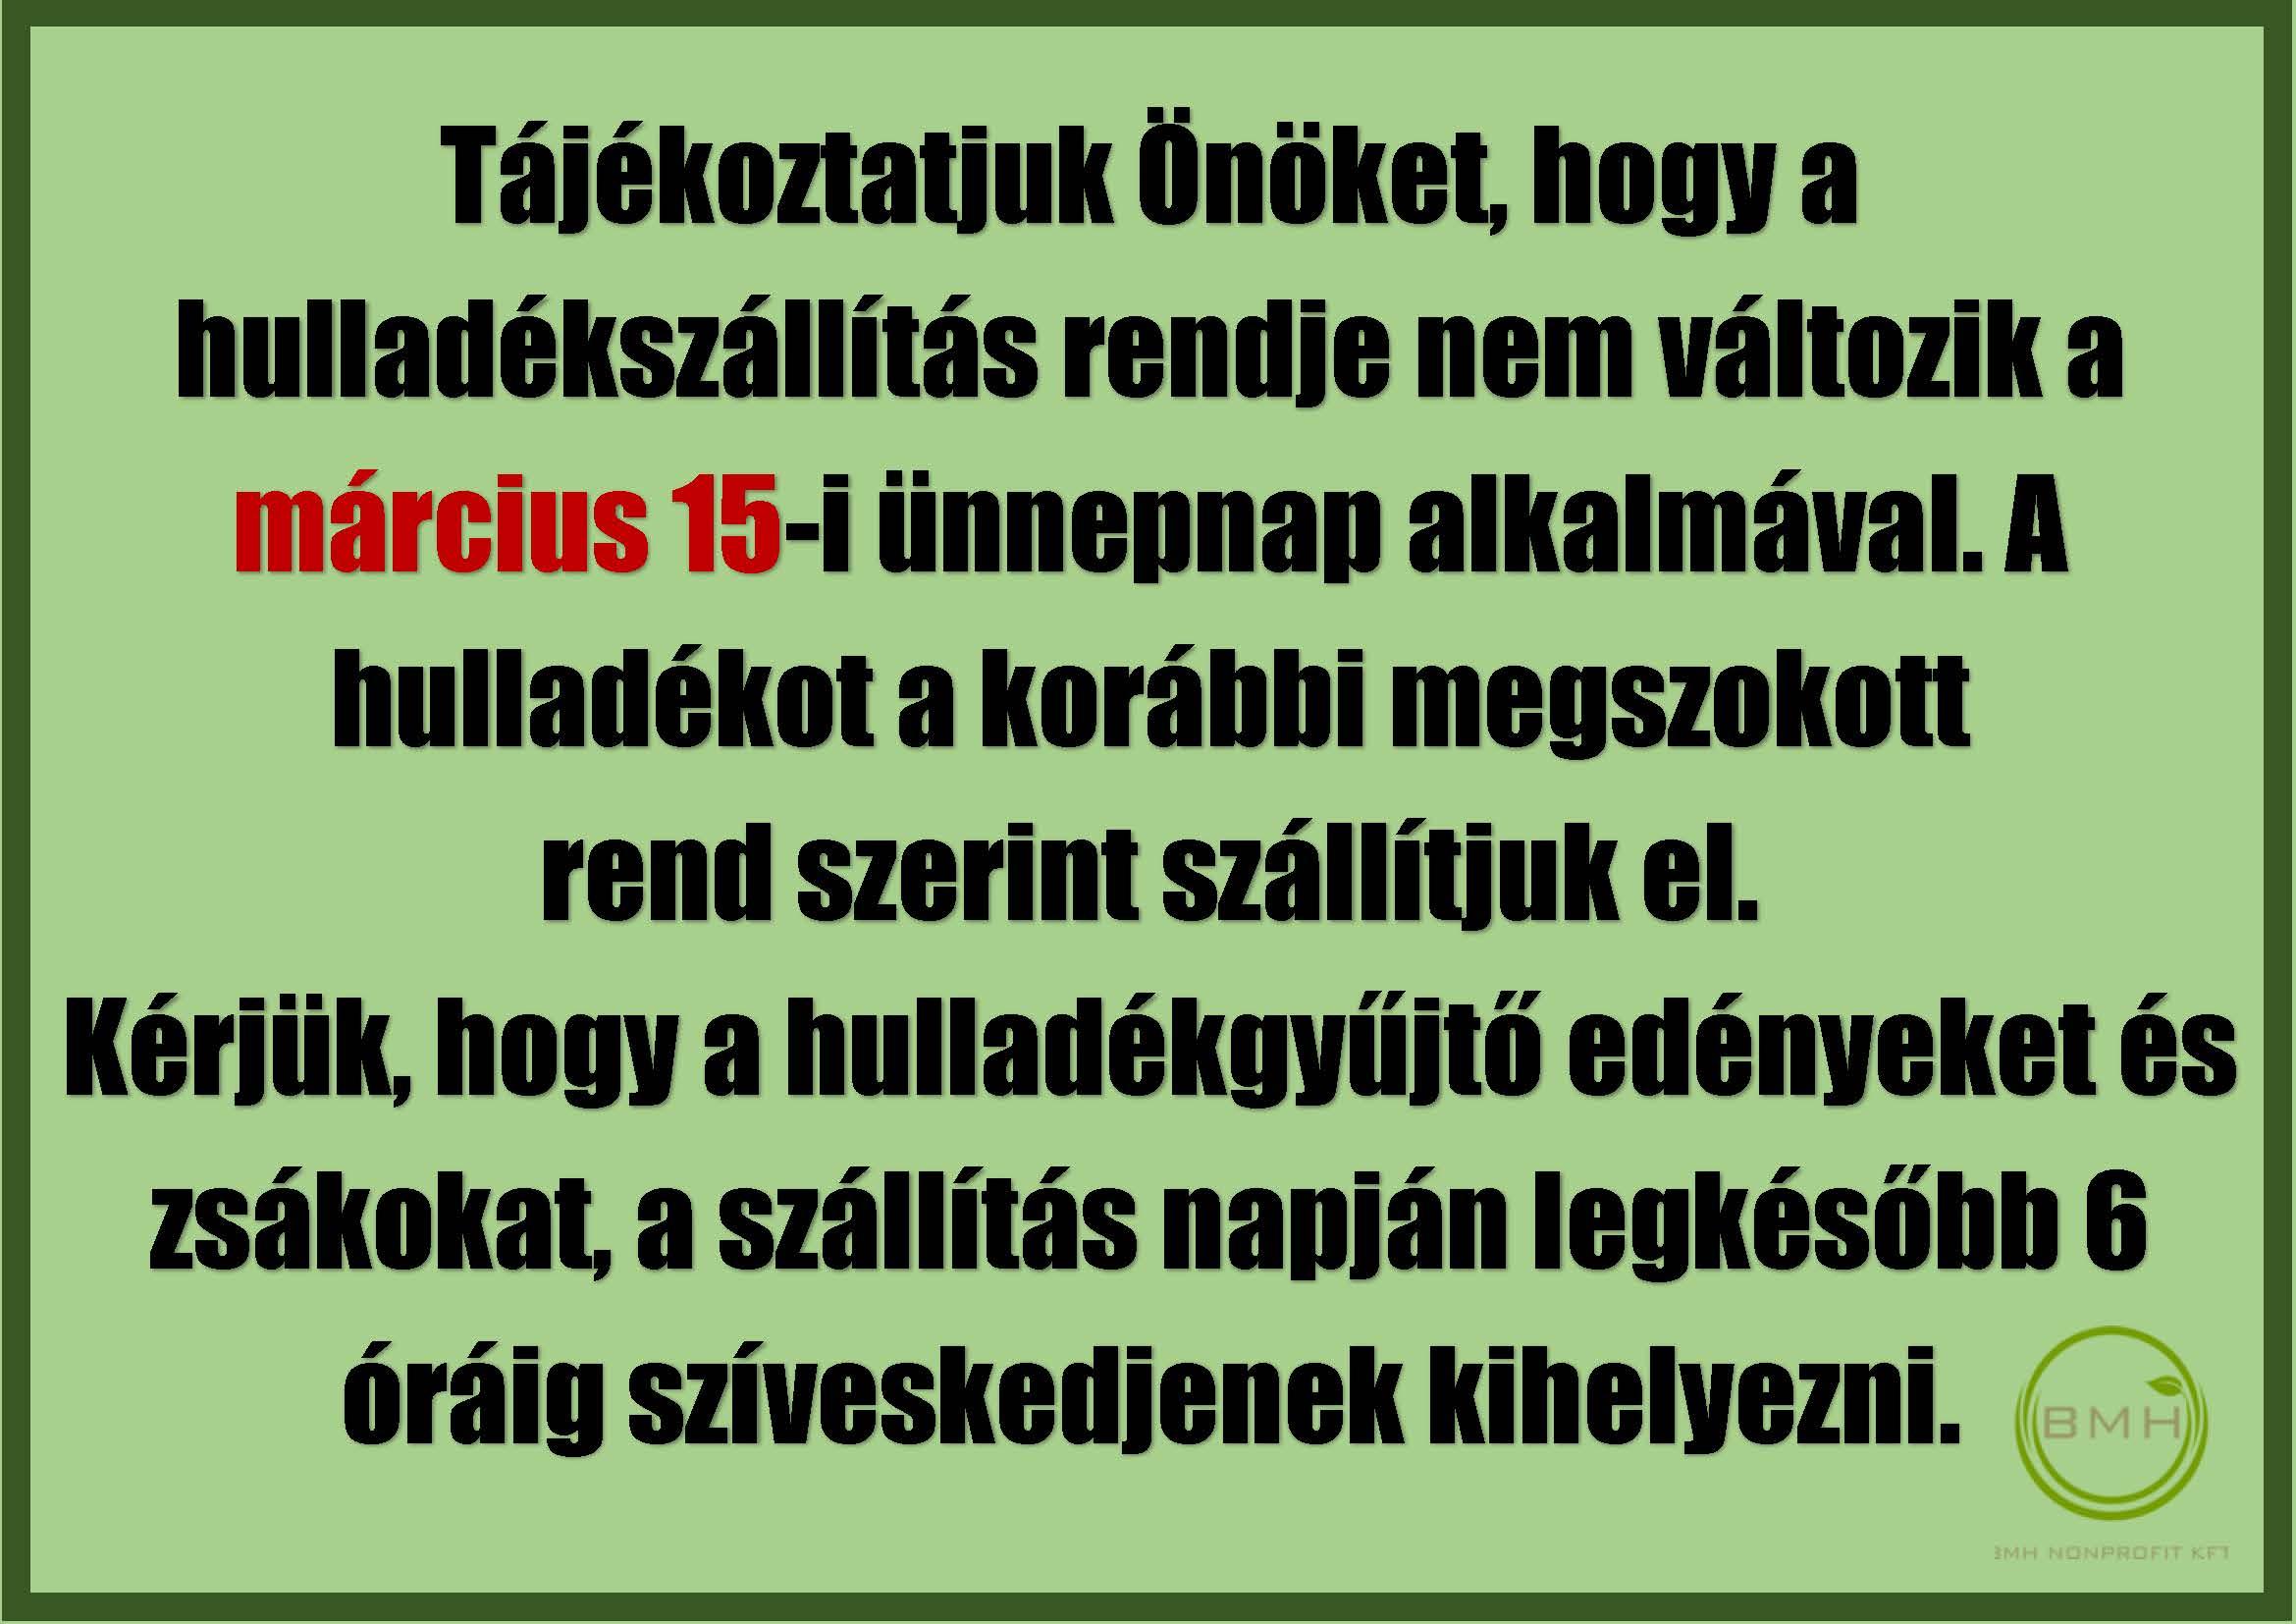 hulladek_marc15